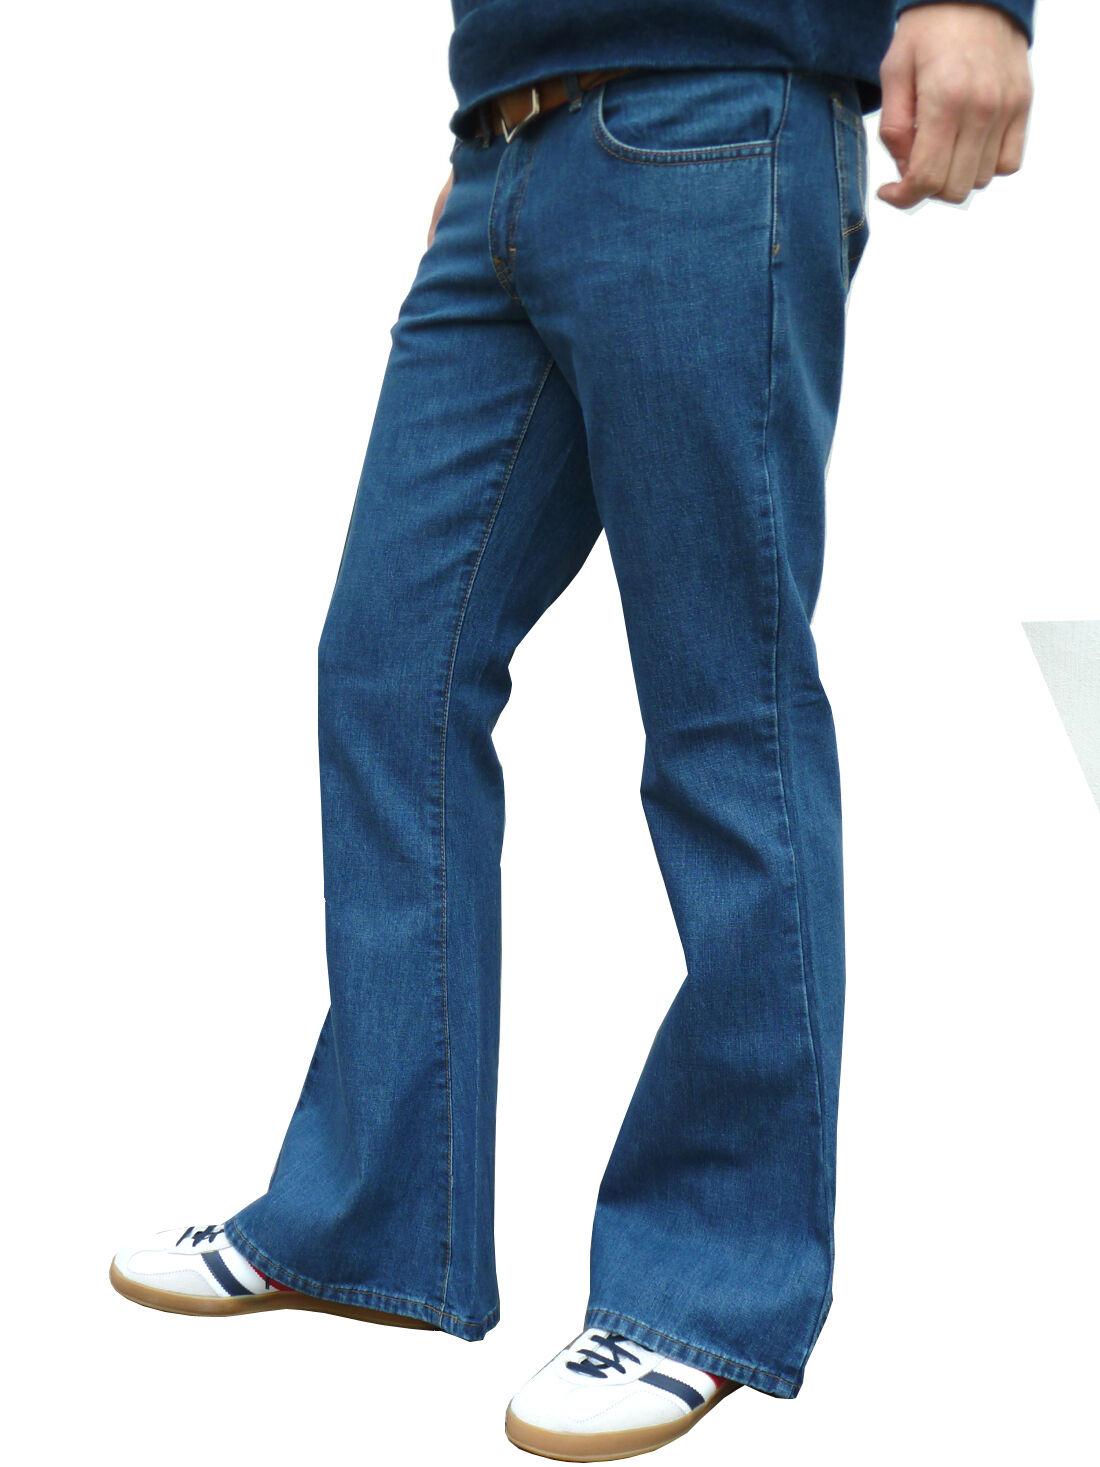 Mens Denim Bell Bottom Flares Jeans Vtg 60s 70s Indie Mod Hippy Stonewash